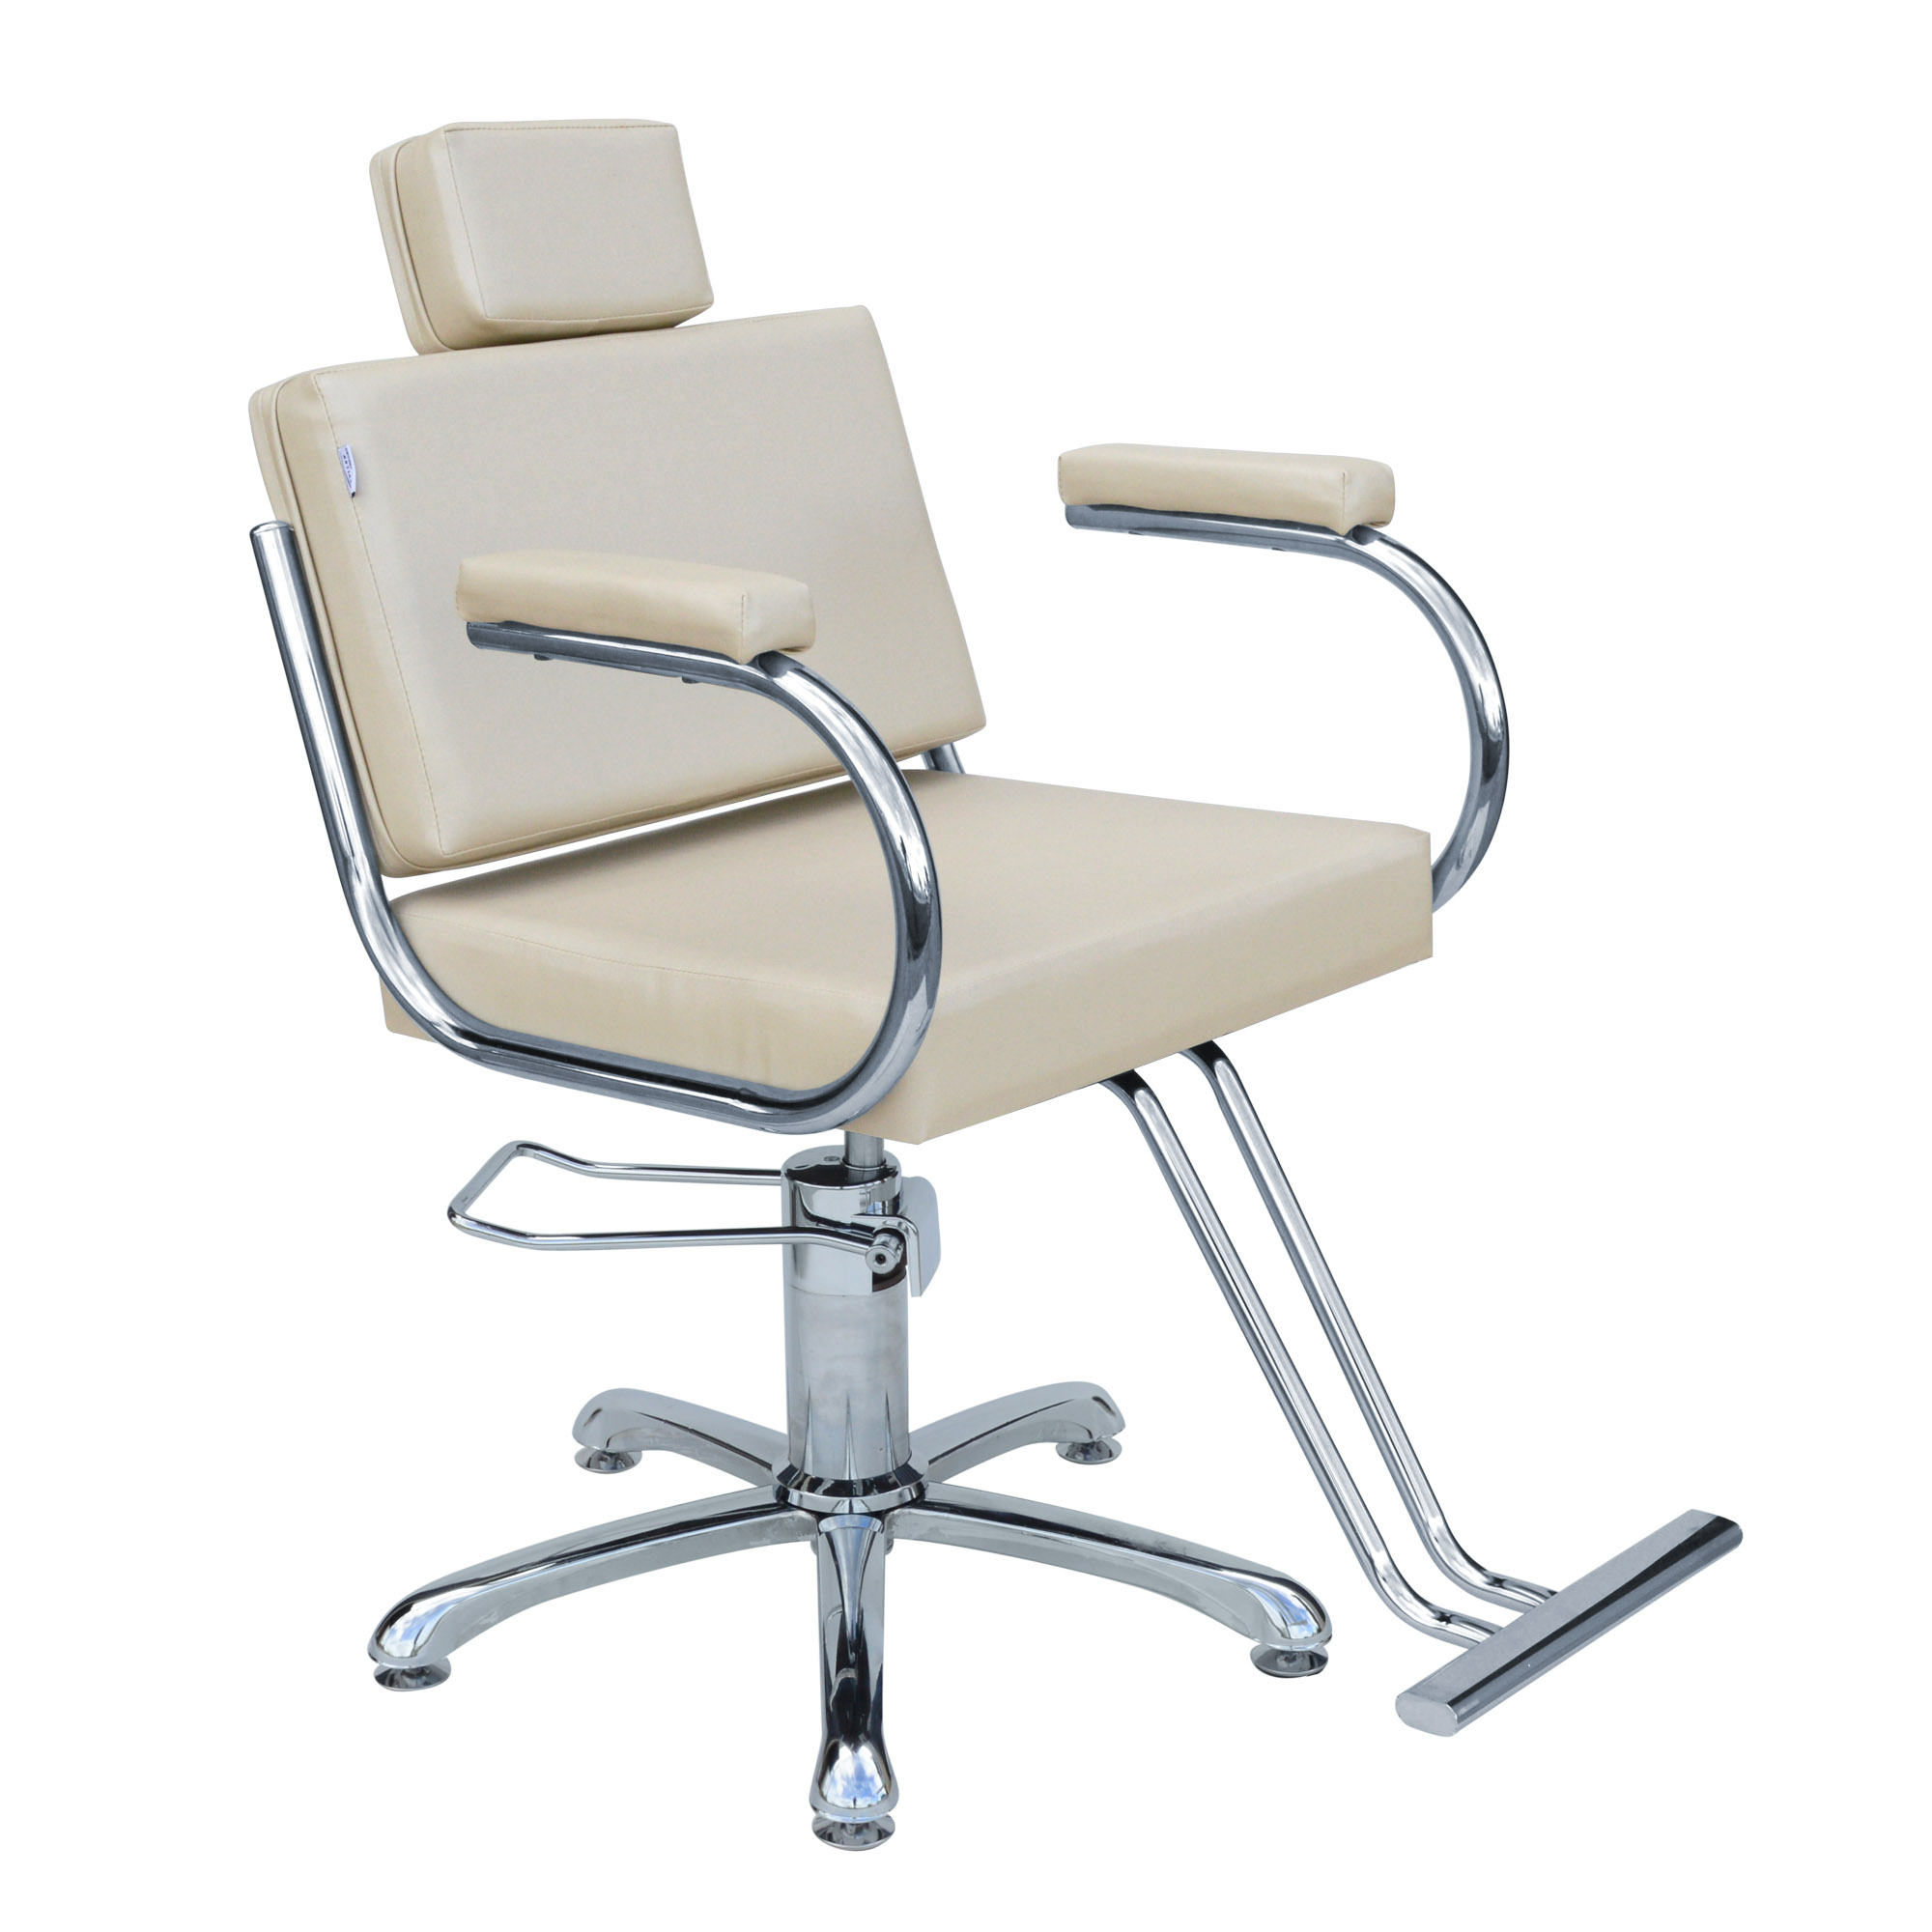 Cadeira Poltrona Hidráulica Lotus Fixa